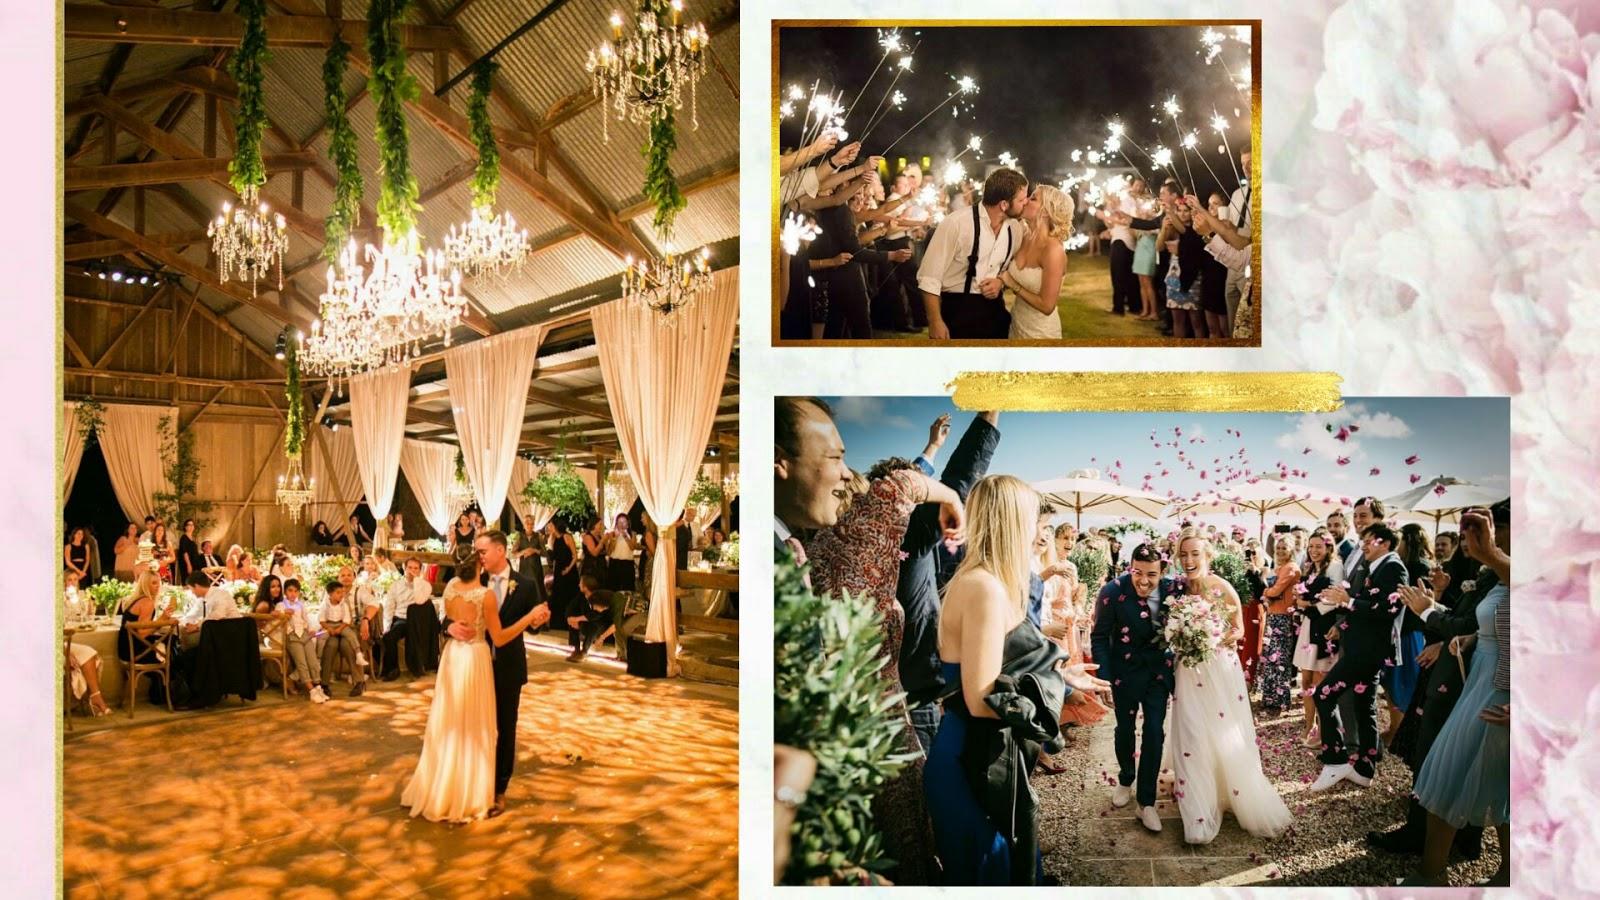 Detalles de boda para impresionar a tus invitados